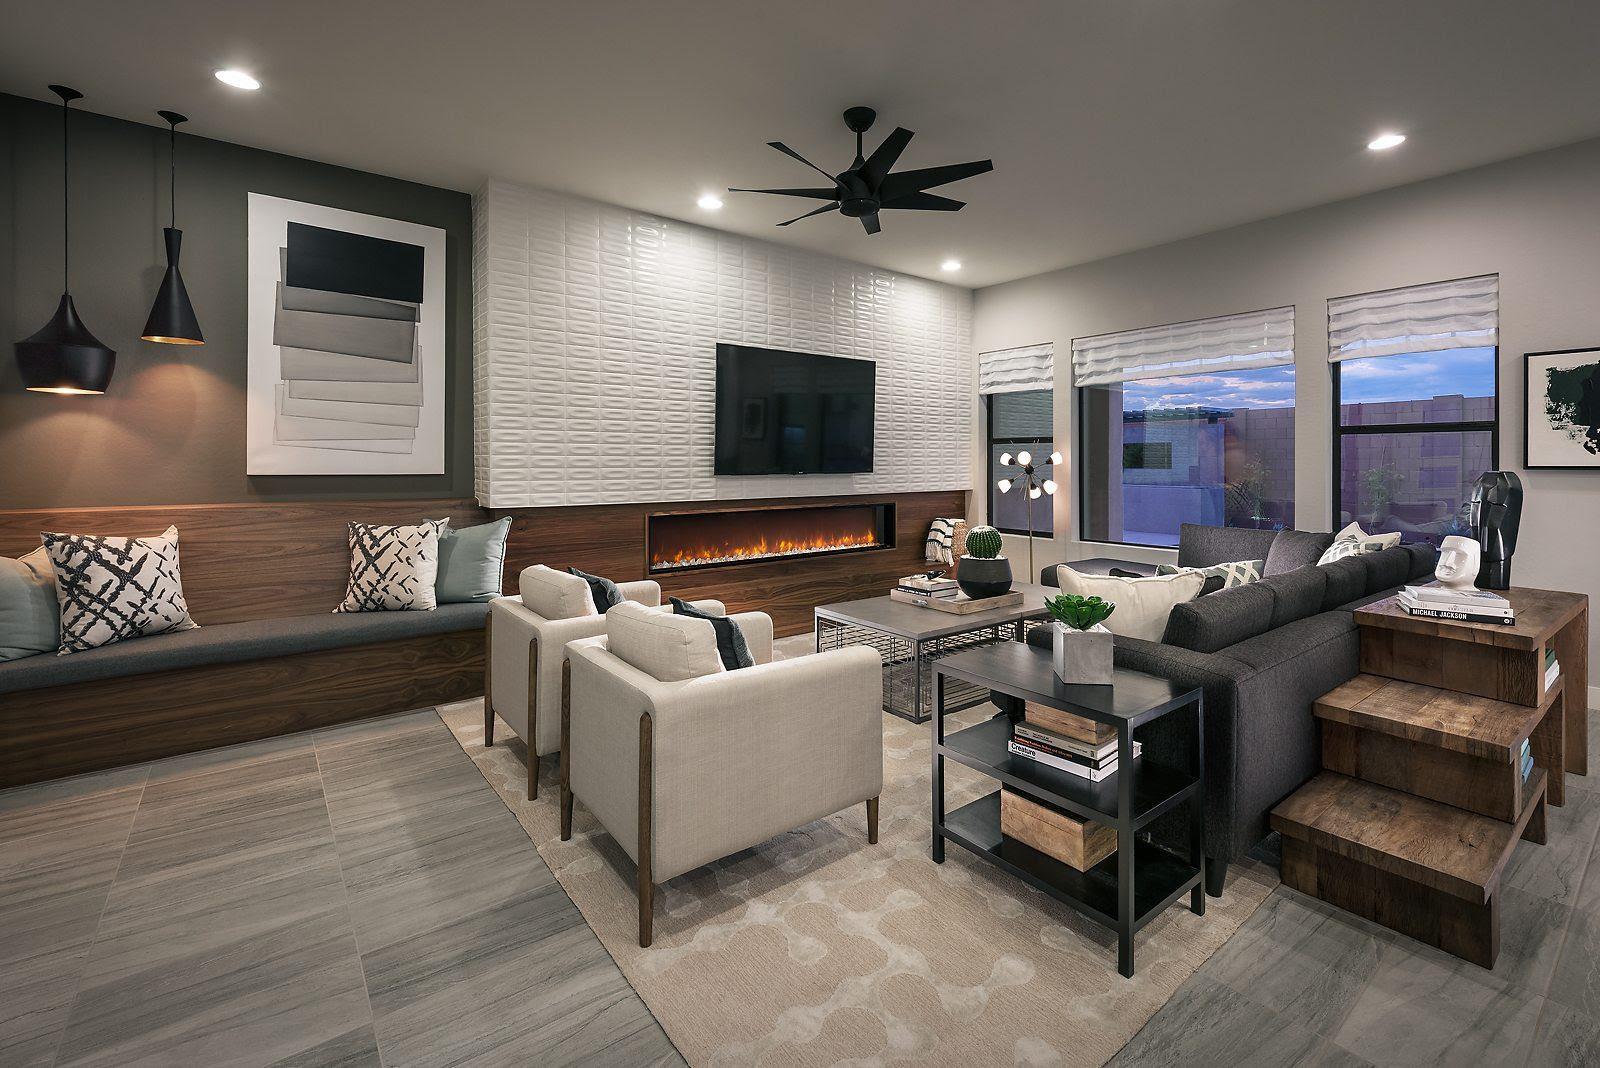 17 069 19 Modern Great Room